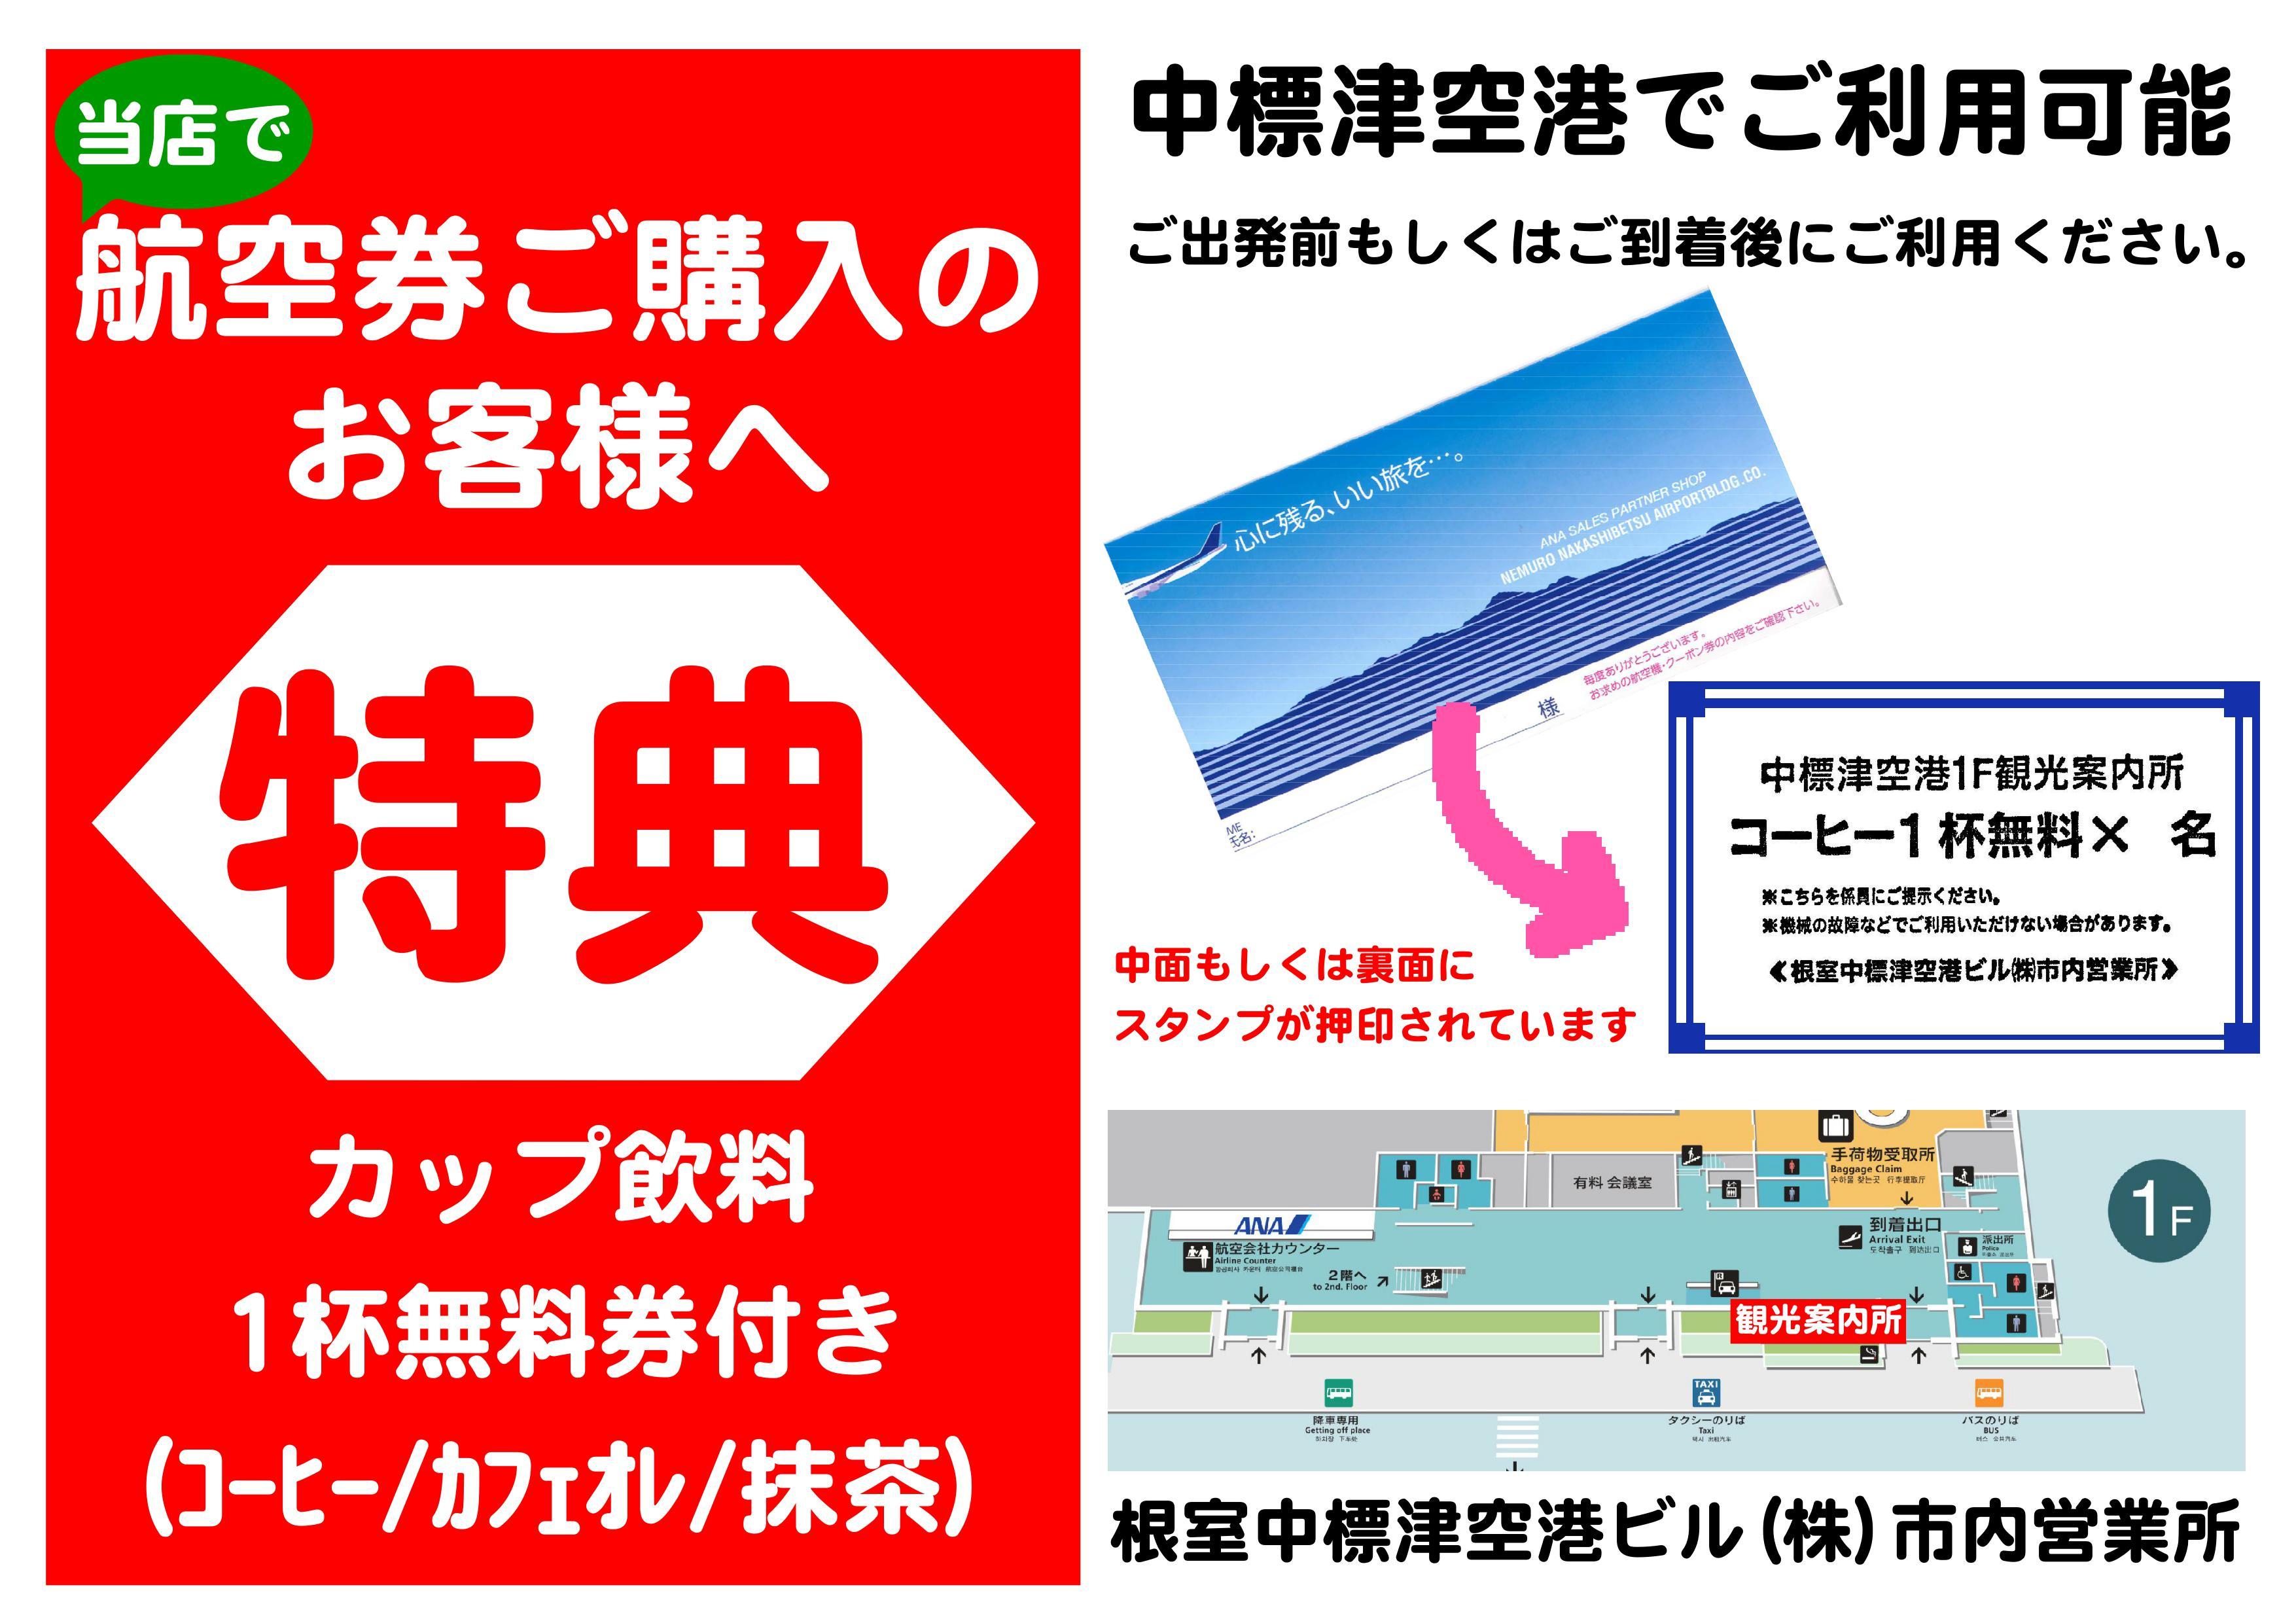 http://www.nakashibetsu-airport.jp/%E7%89%B9%E5%85%B8.jpg